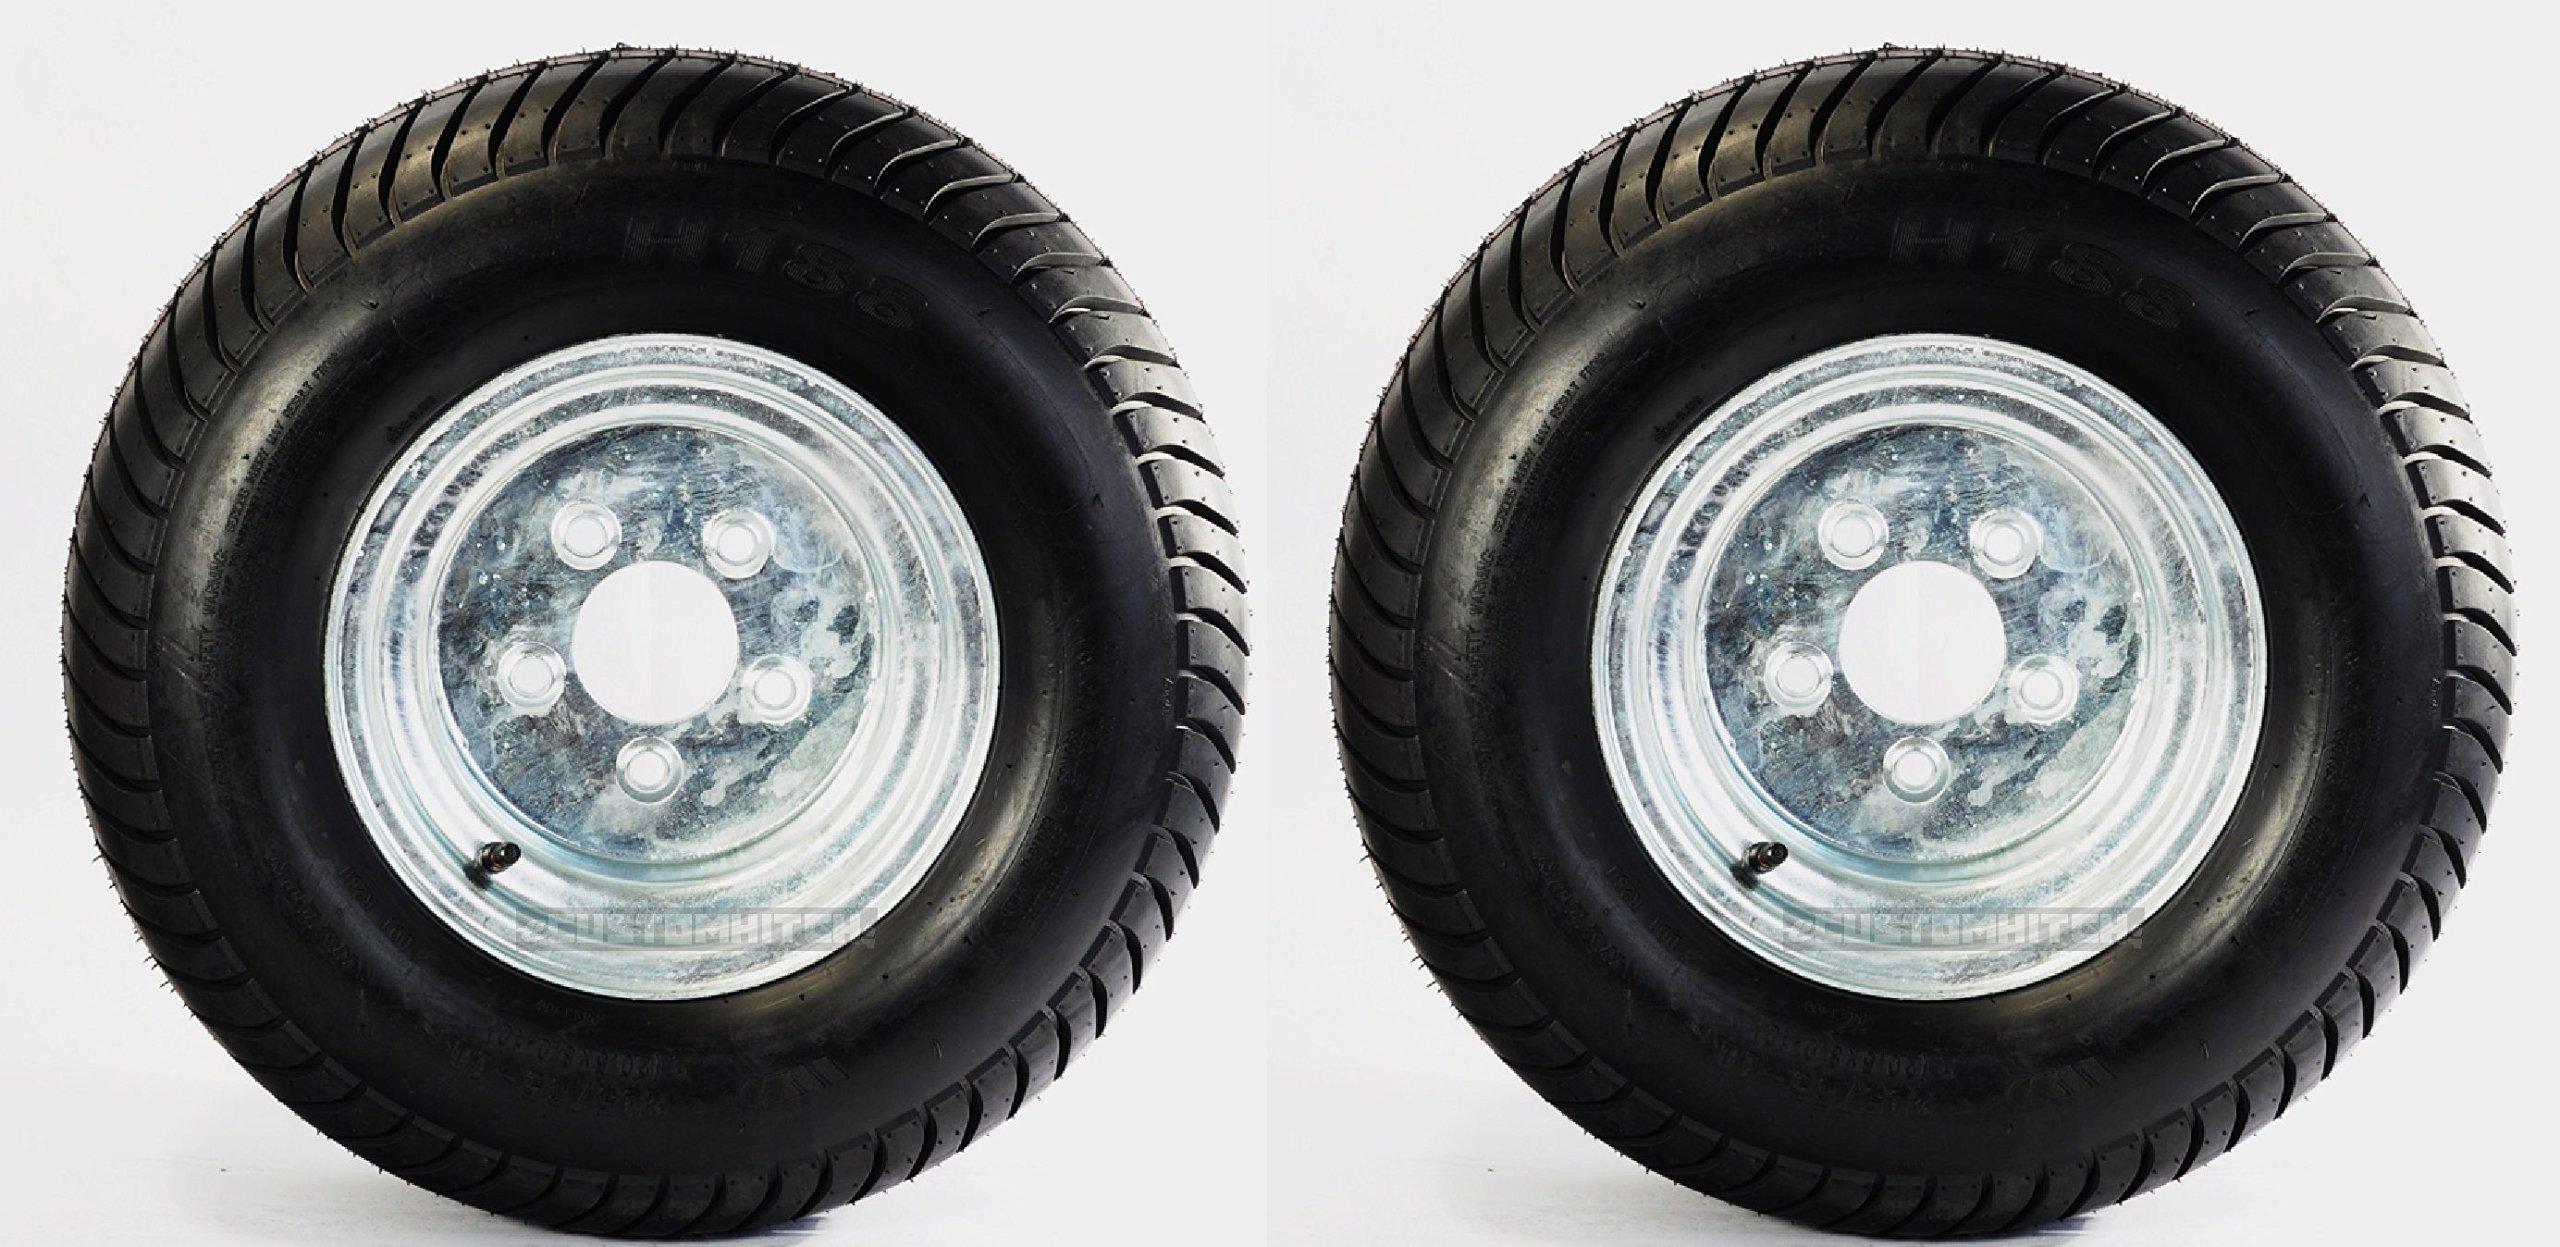 Two Utility Trailer Tires Rims 20.5X8-10 205/65-10 20.5/8-10 5 Lug Range E GALV